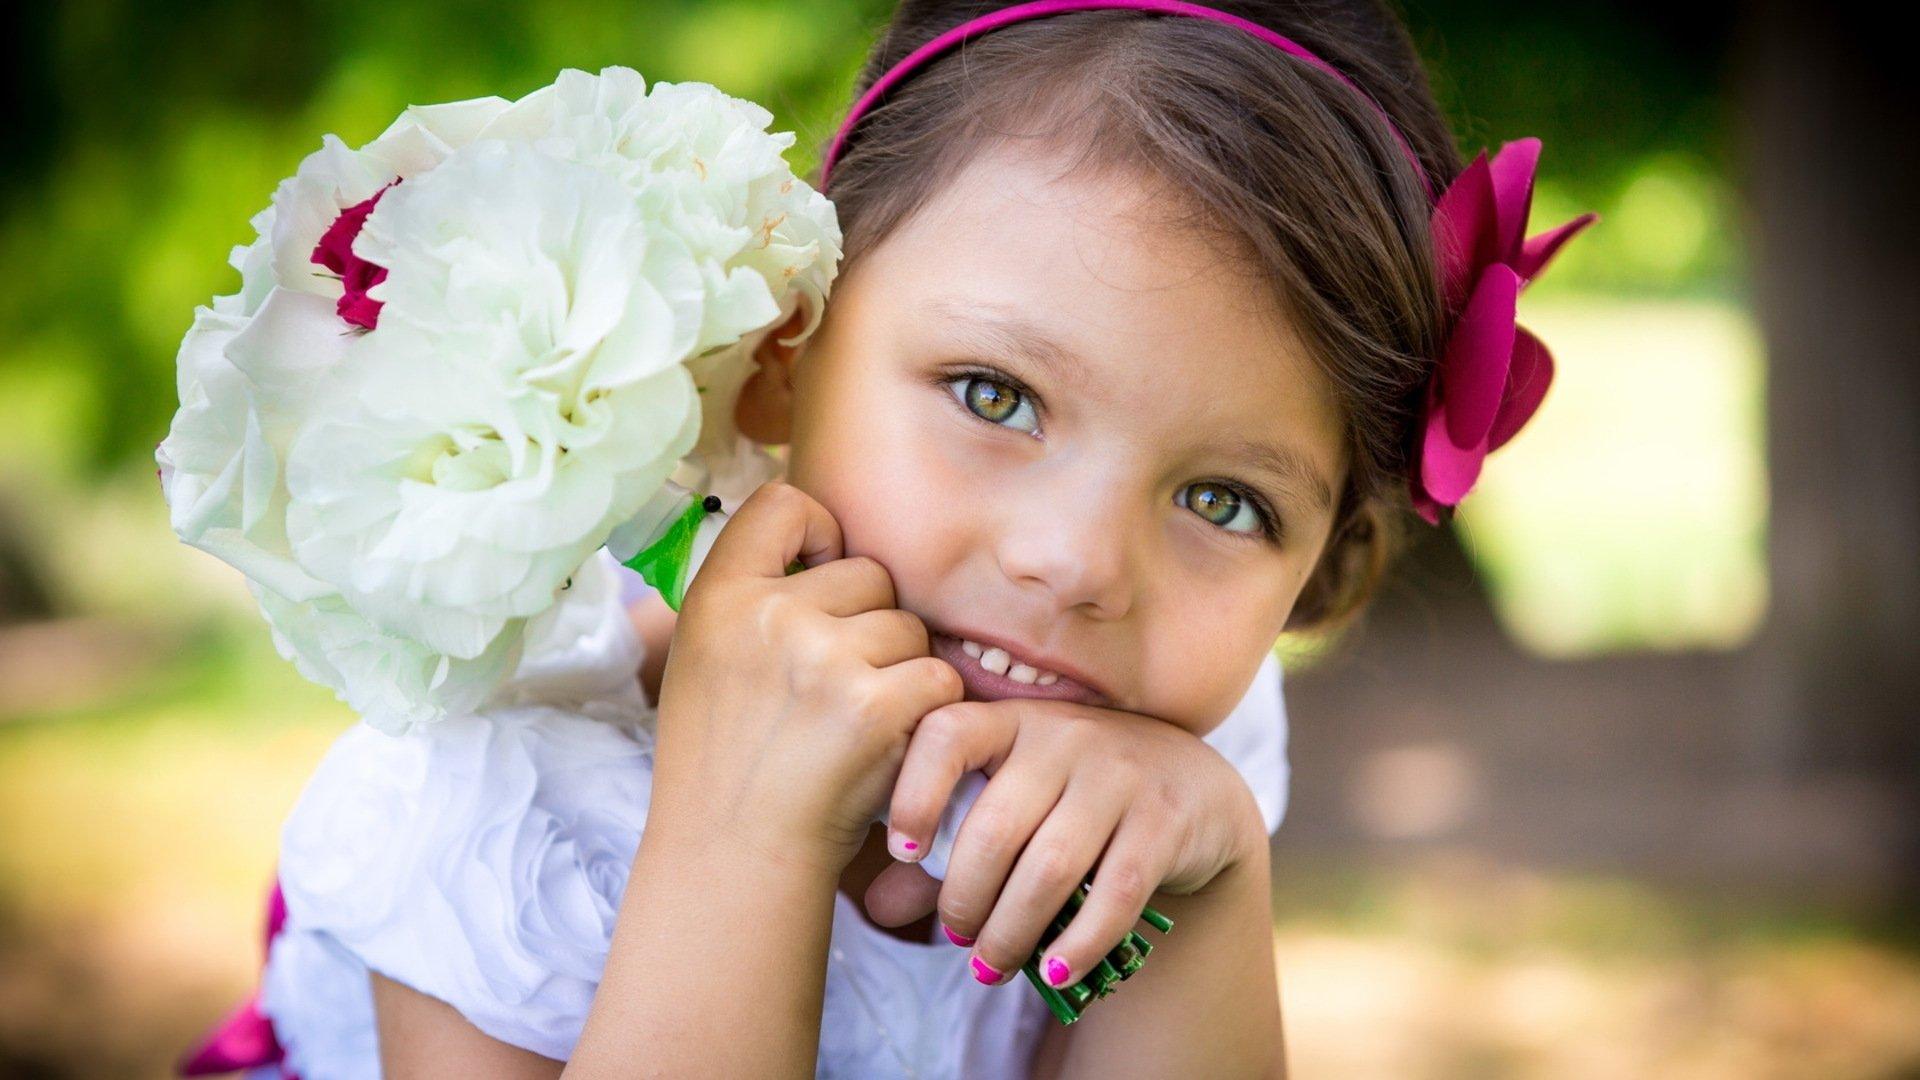 Sweet Small Girl Hd Wallpaper Sweet Angel With Flowers Children Wallpaper 1920x1080